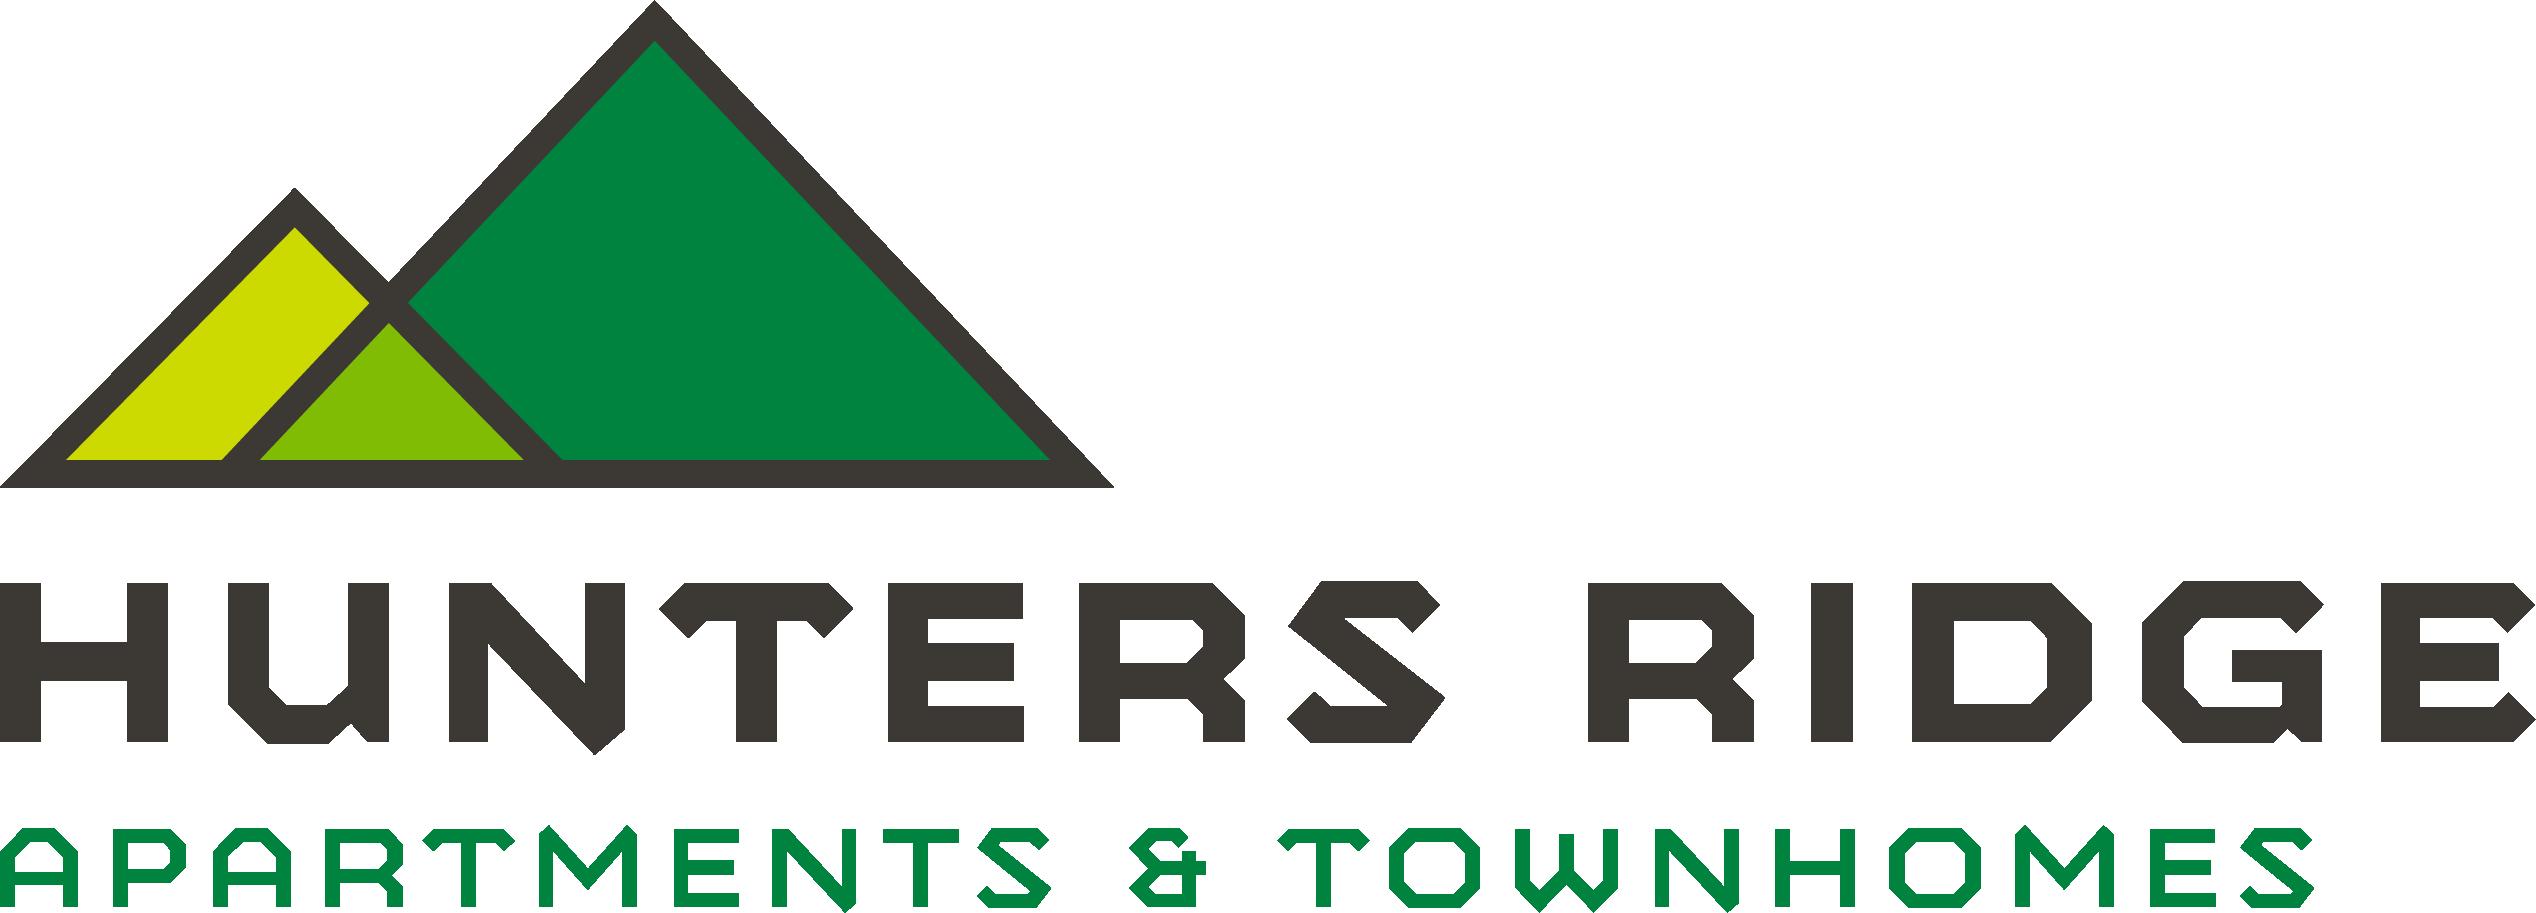 Regency - Hunters Ridge Apartments - Branding